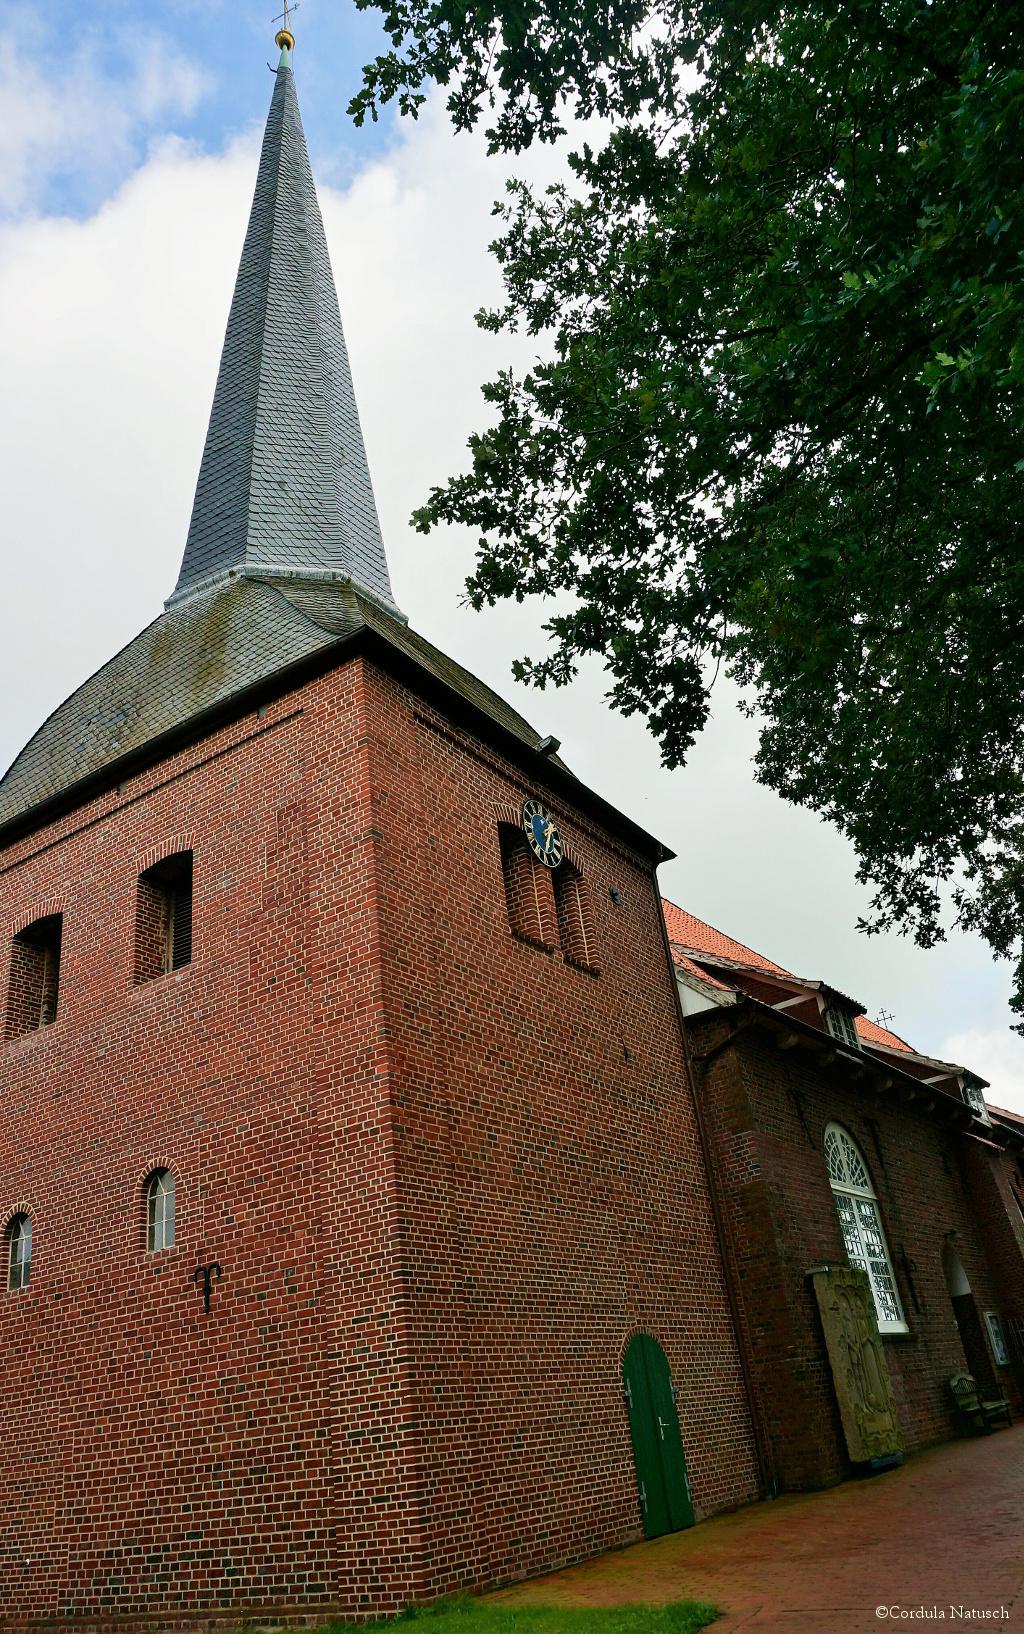 Kirche St. Georg in Oberndorf an der Oste Kirche St. Georg in Oberndorf an der Oste